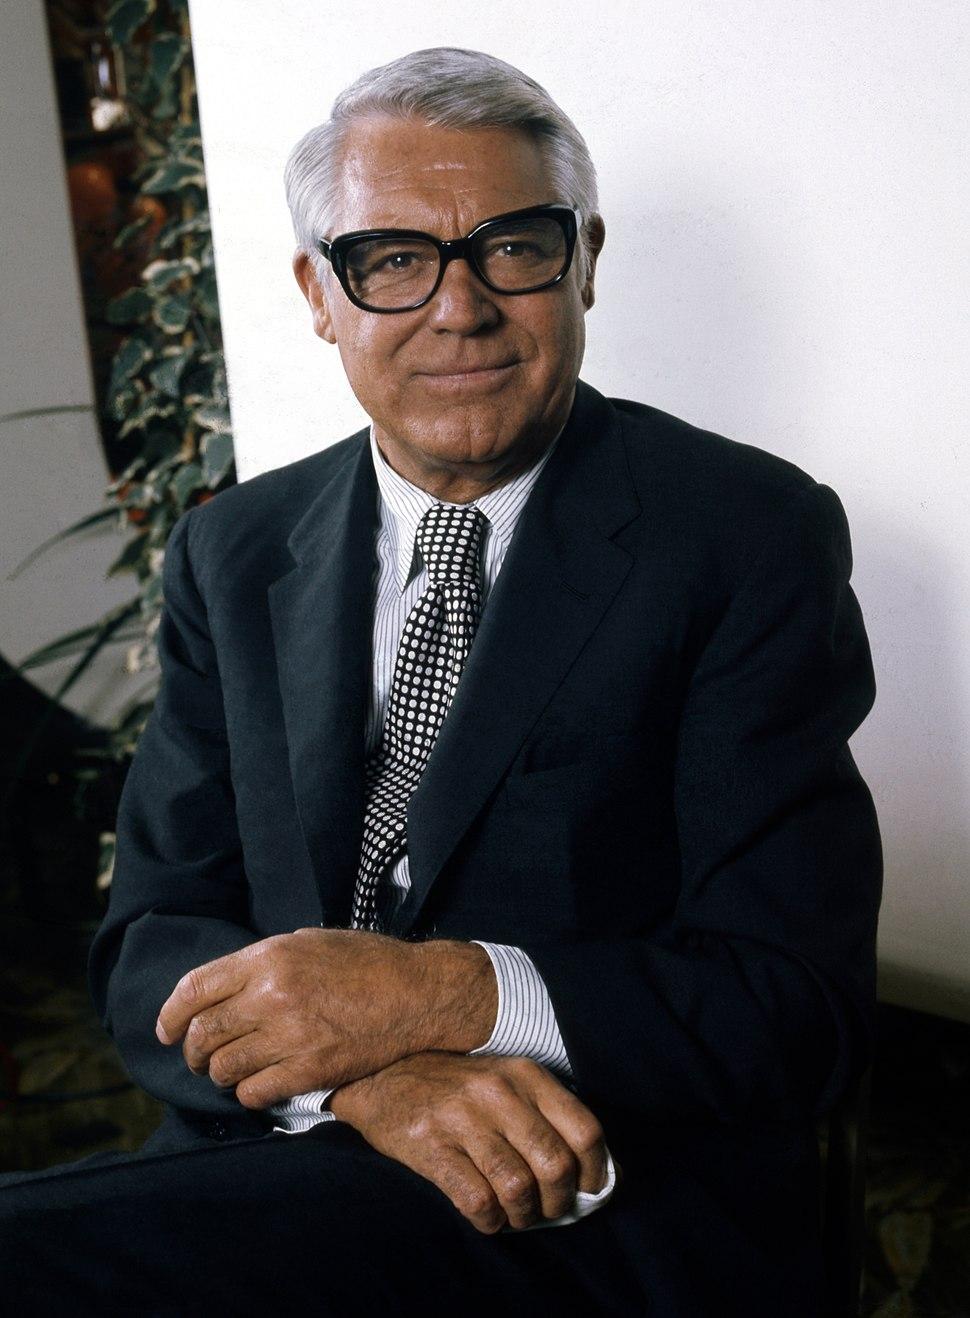 Cary Grant in glasses Allan Warren